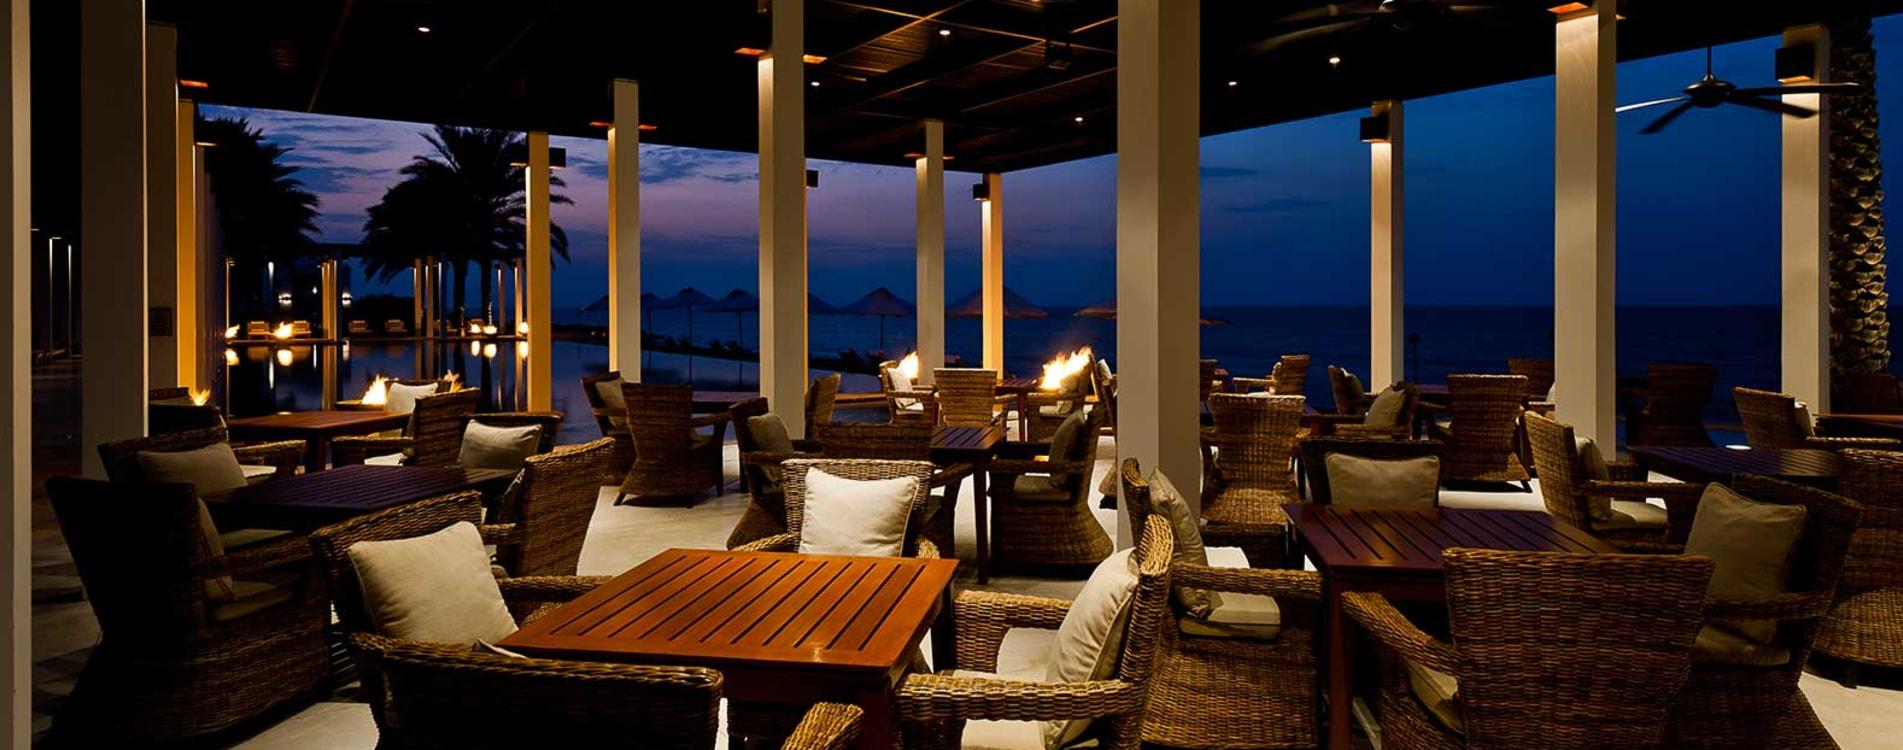 Chedi-Muscat-Dining-Chedi-Pool-Cabana.jpg